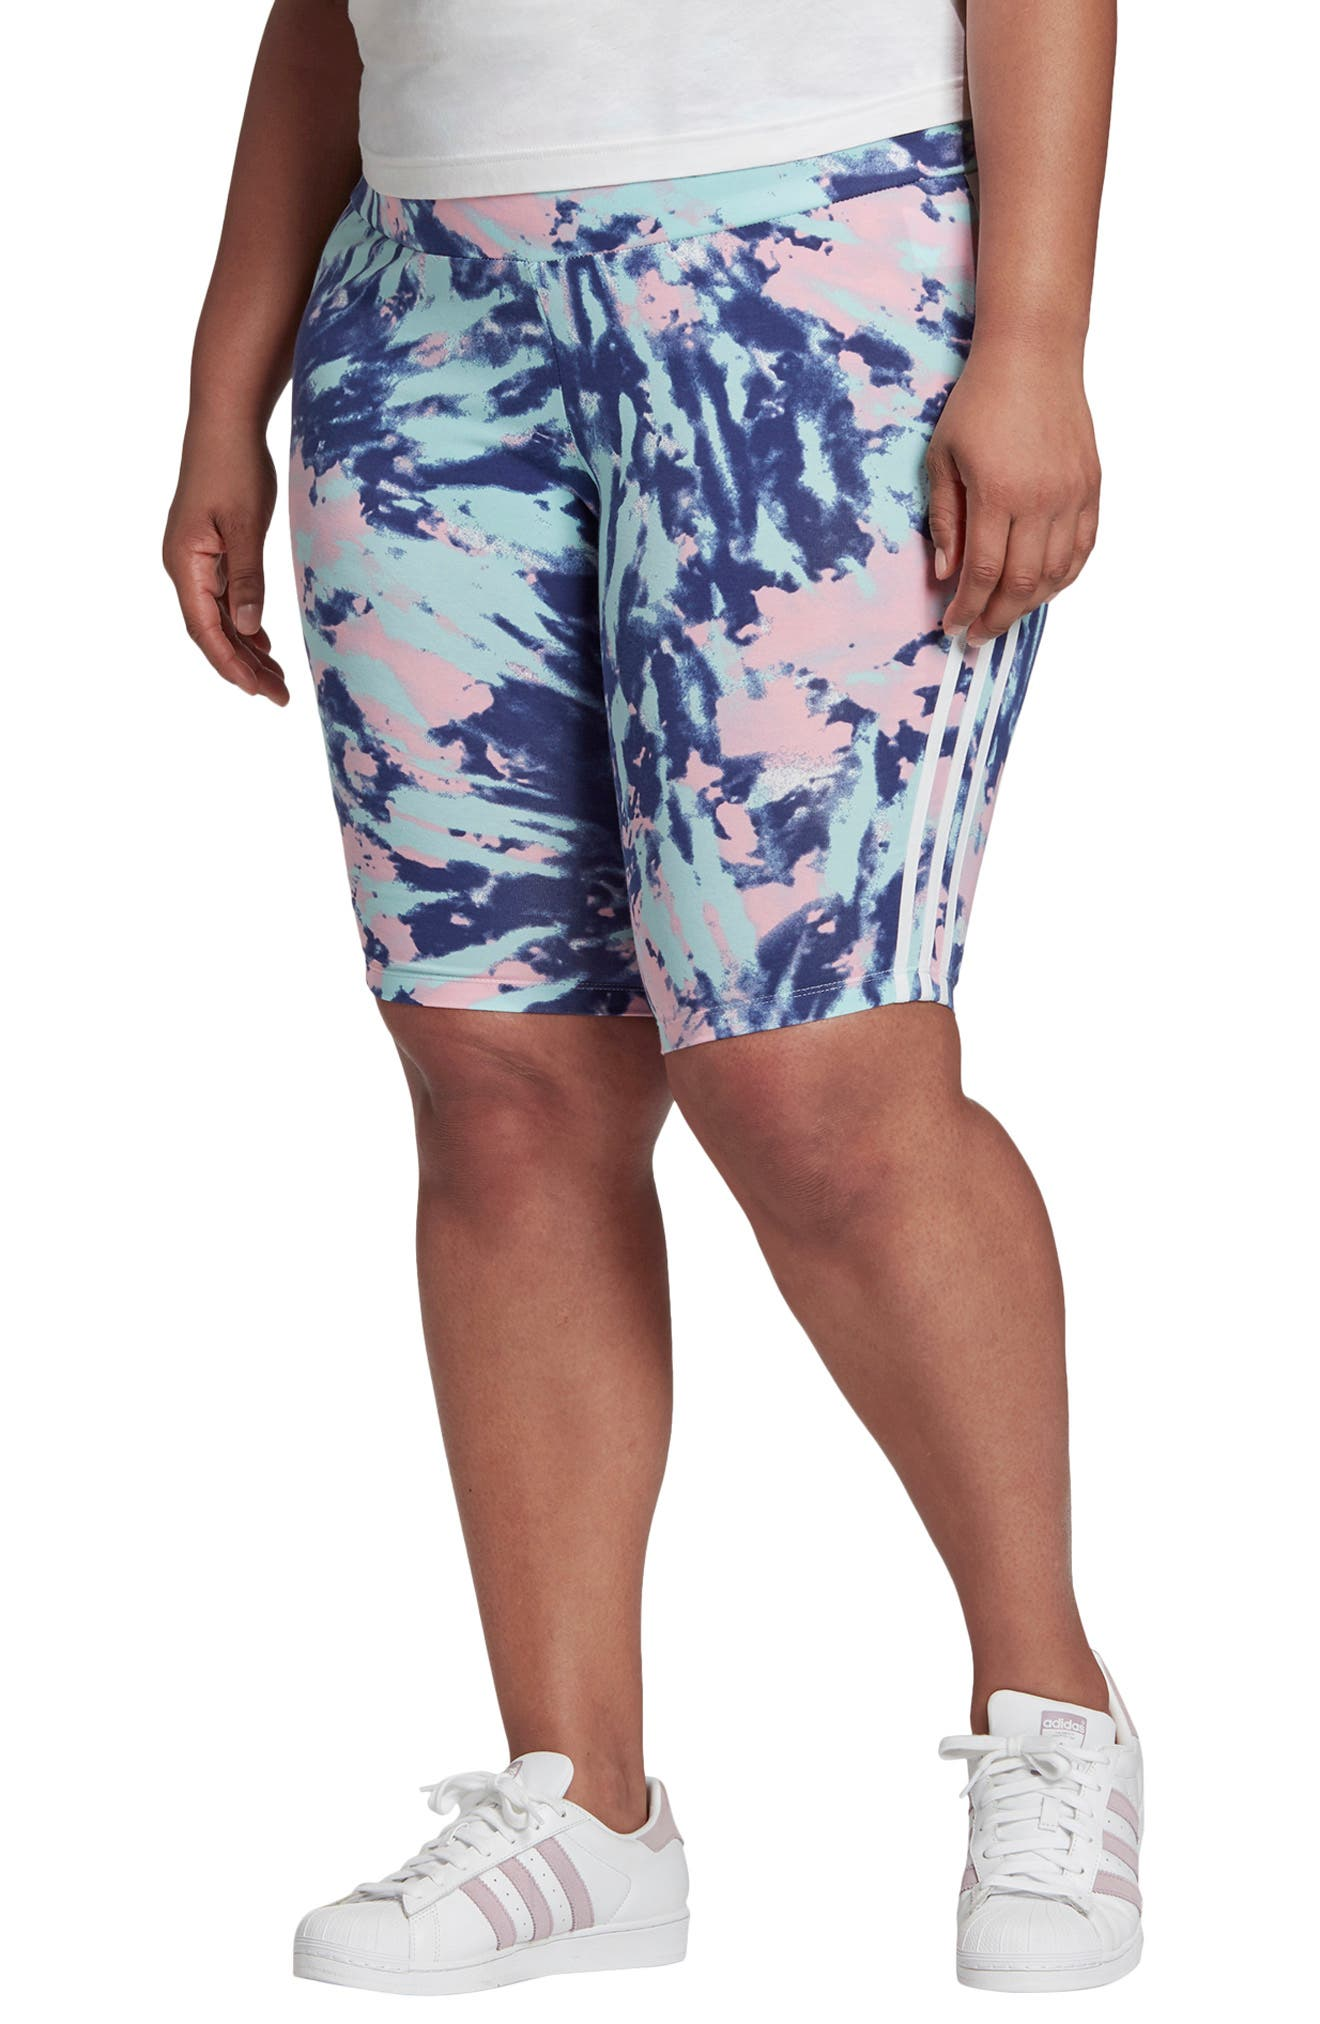 Plus Women's Adidas Originals Adicolor Tie Dye Bike Shorts